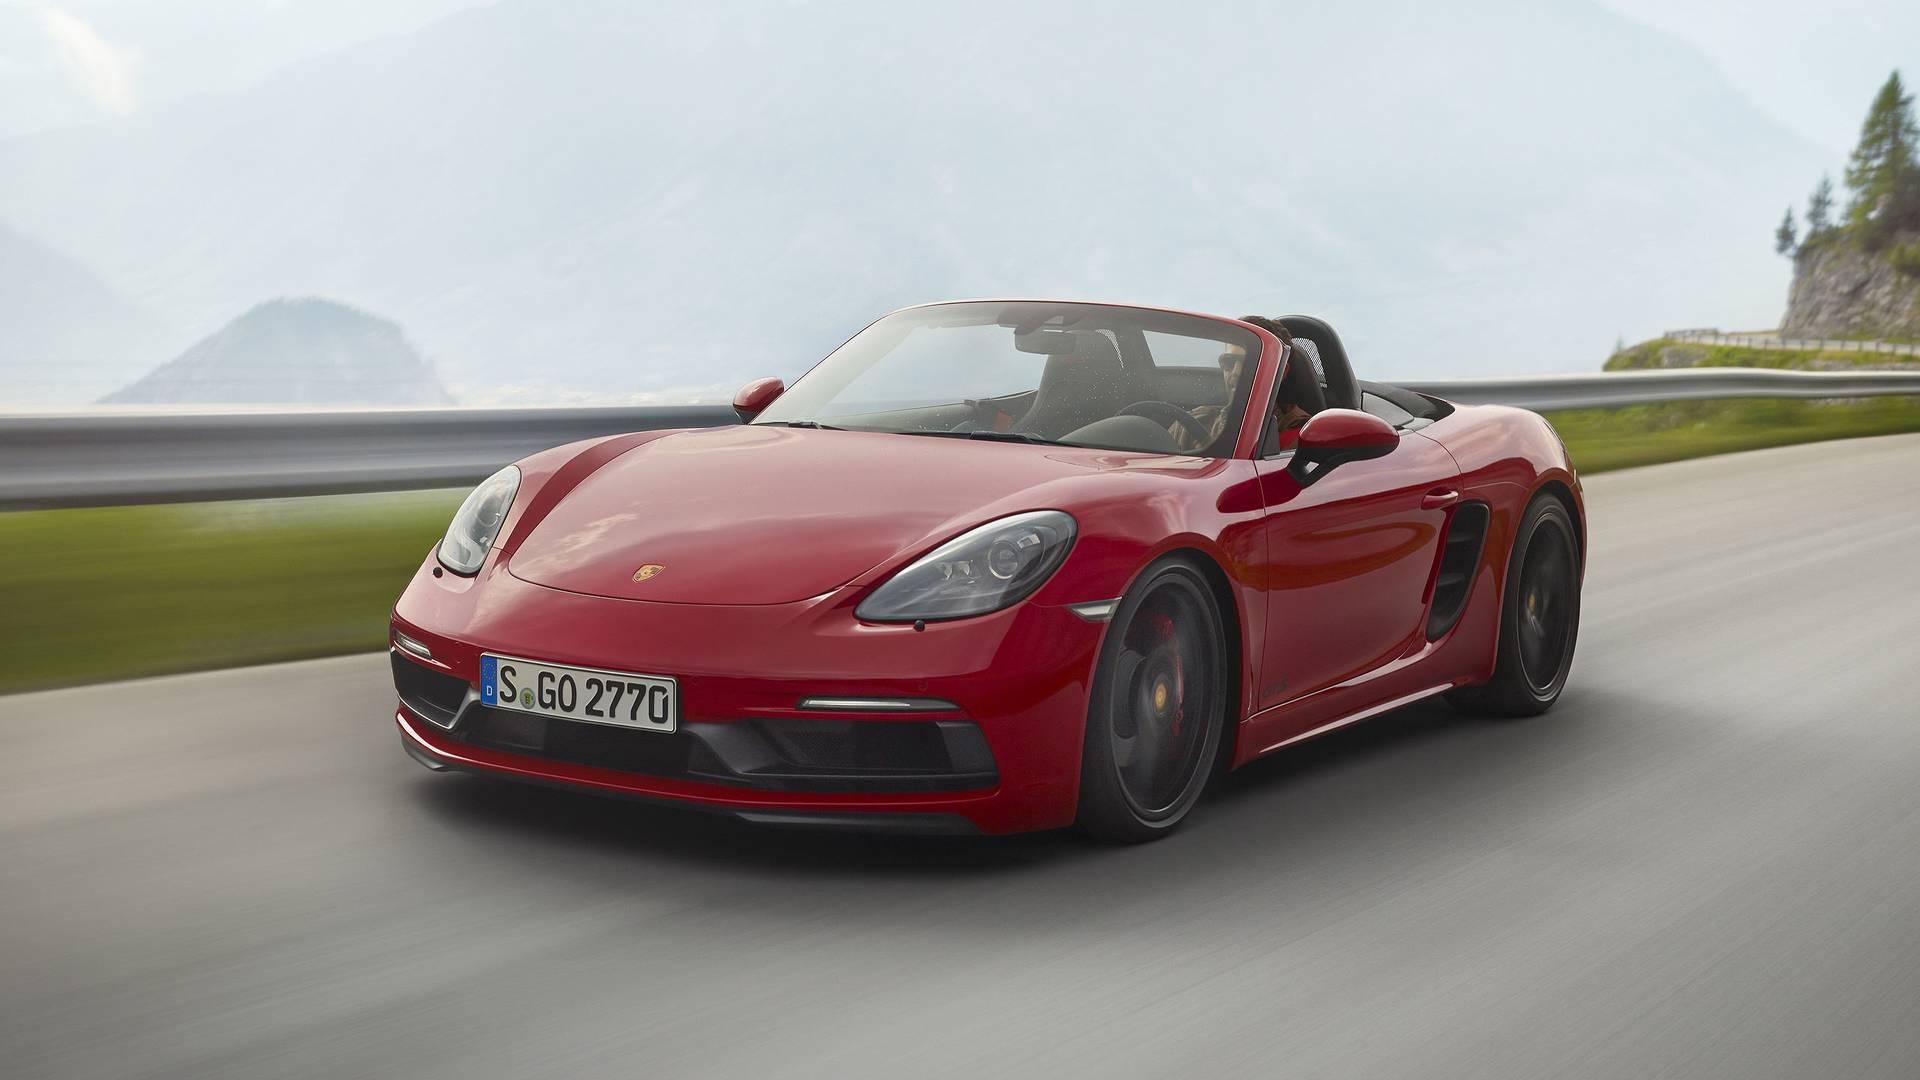 Porsche Dealers South Florida >> VWVortex.com - Porsche 718 Boxster GTS & 718 Cayman GTS ...